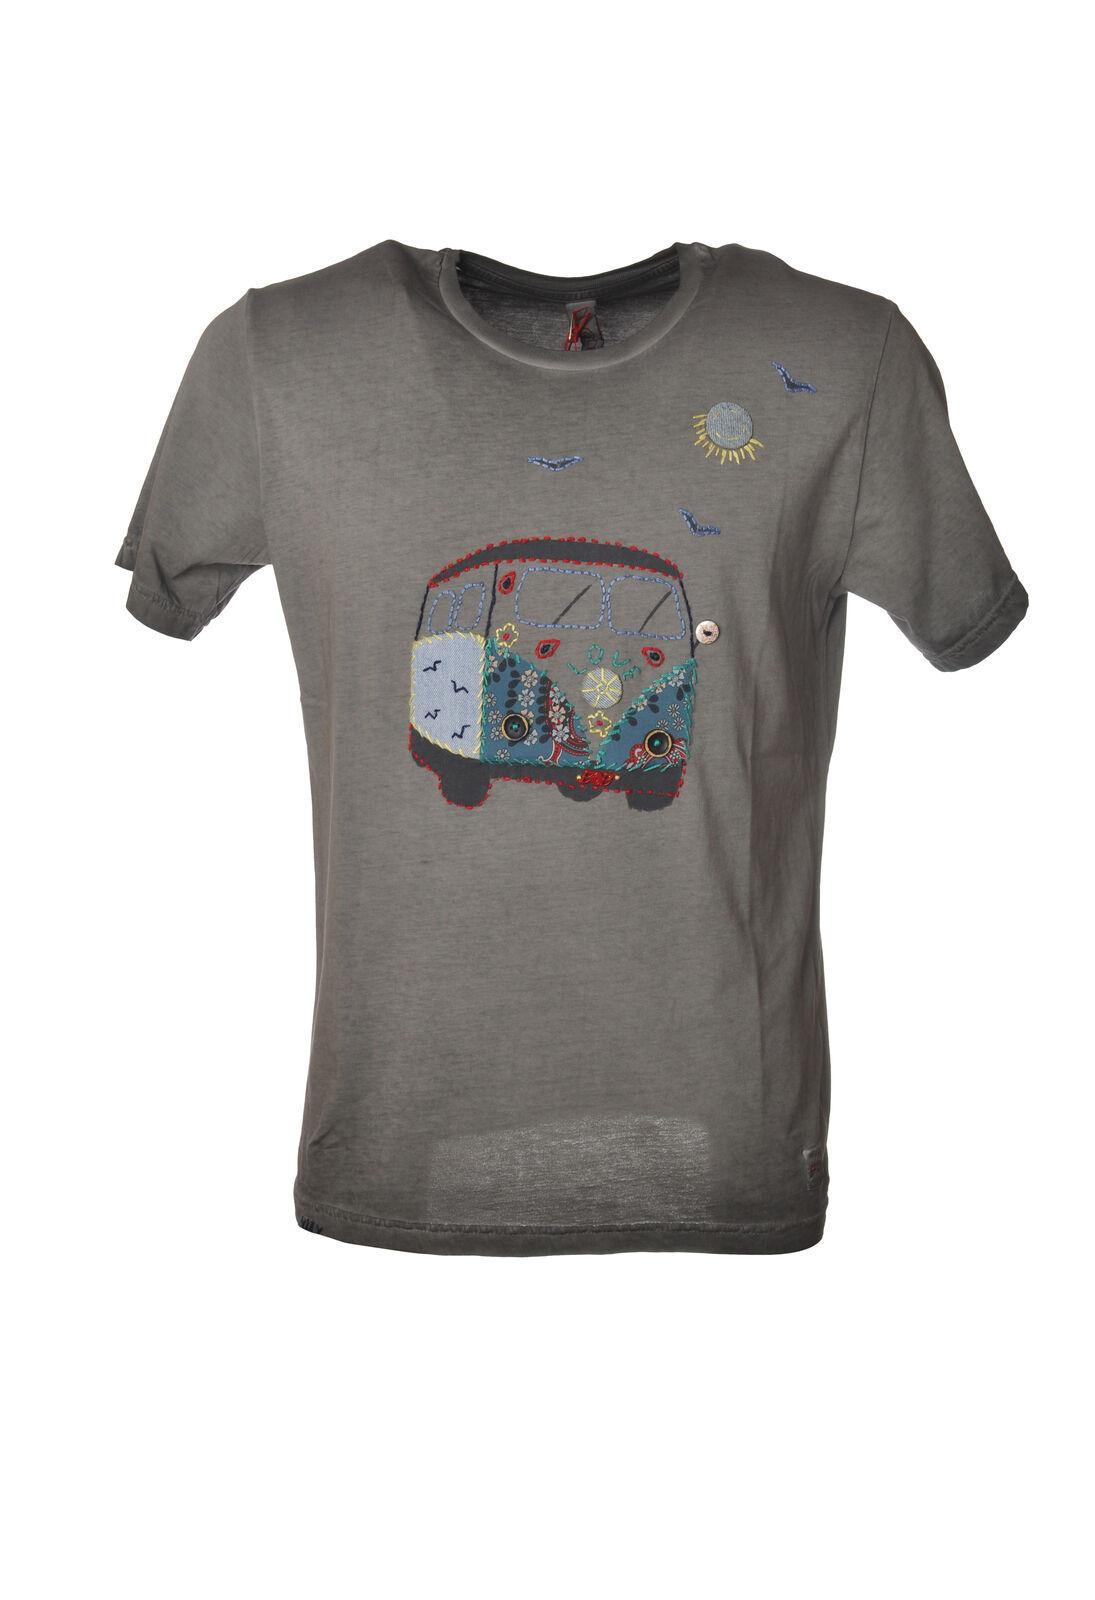 Bob - Topwear-T-shirts - Uomo - Grigio - 6163628C191919